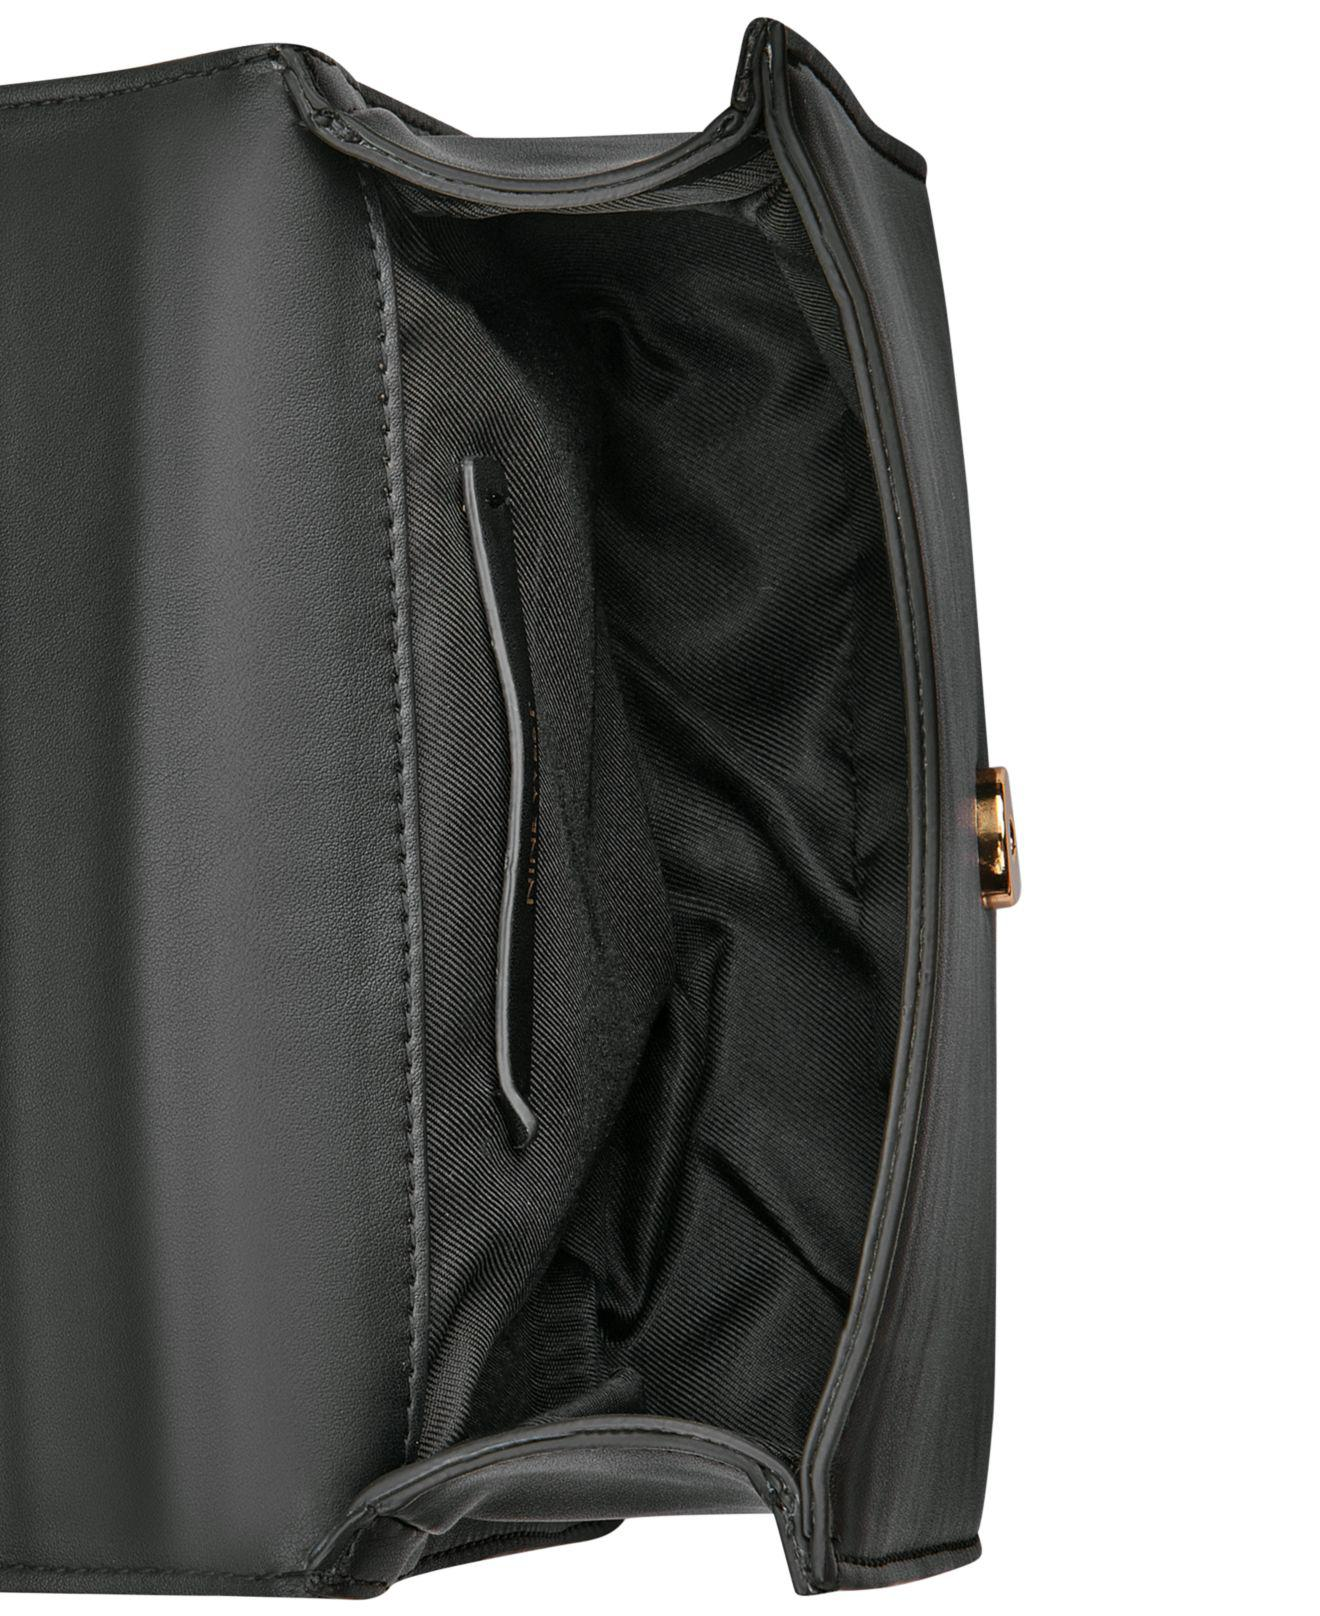 Nine West Thandi Shoulder Bag in Black - Lyst de6ec7140f275